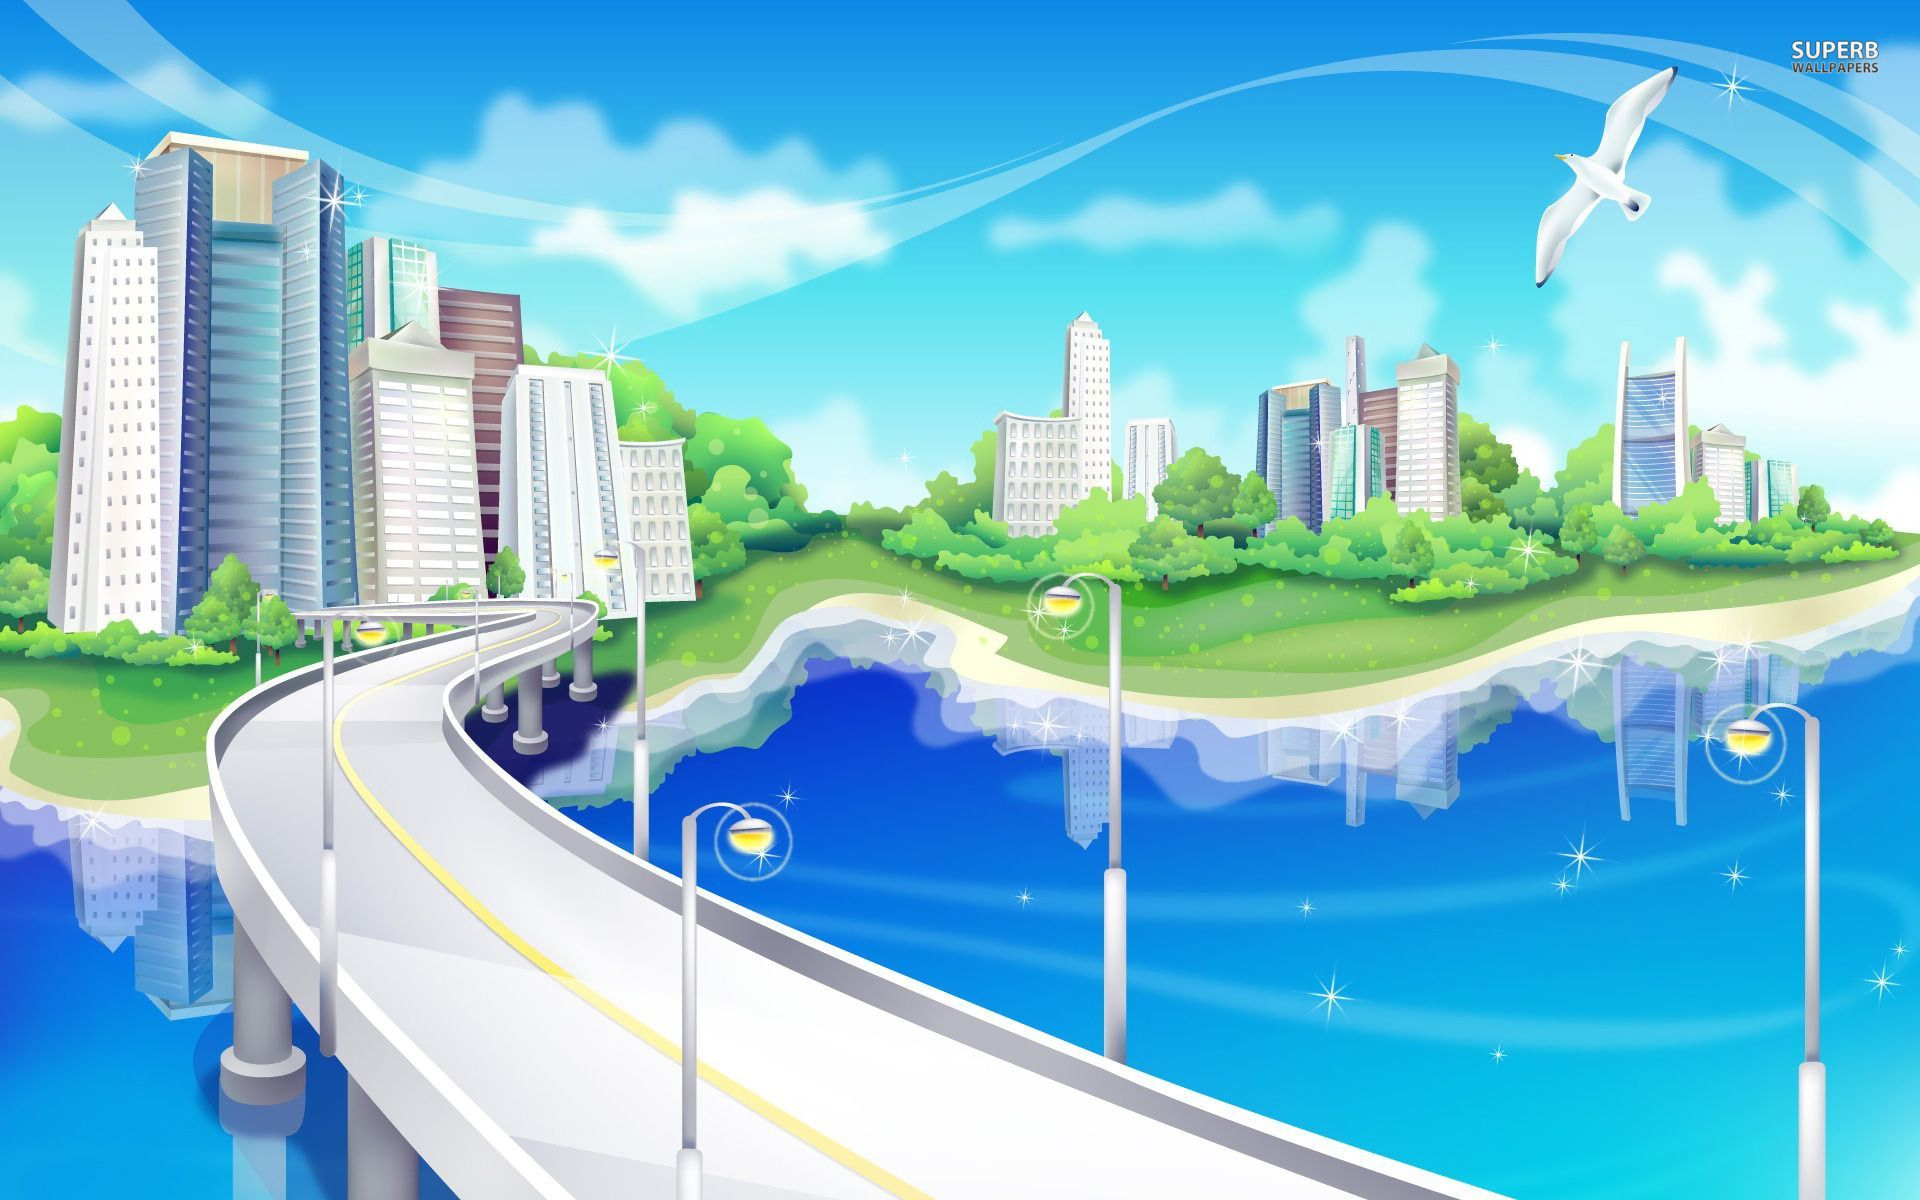 Cartoon City Vector City Cartoon Background Download Hd Wallpapers City Cartoon Cartoon Background City Vector